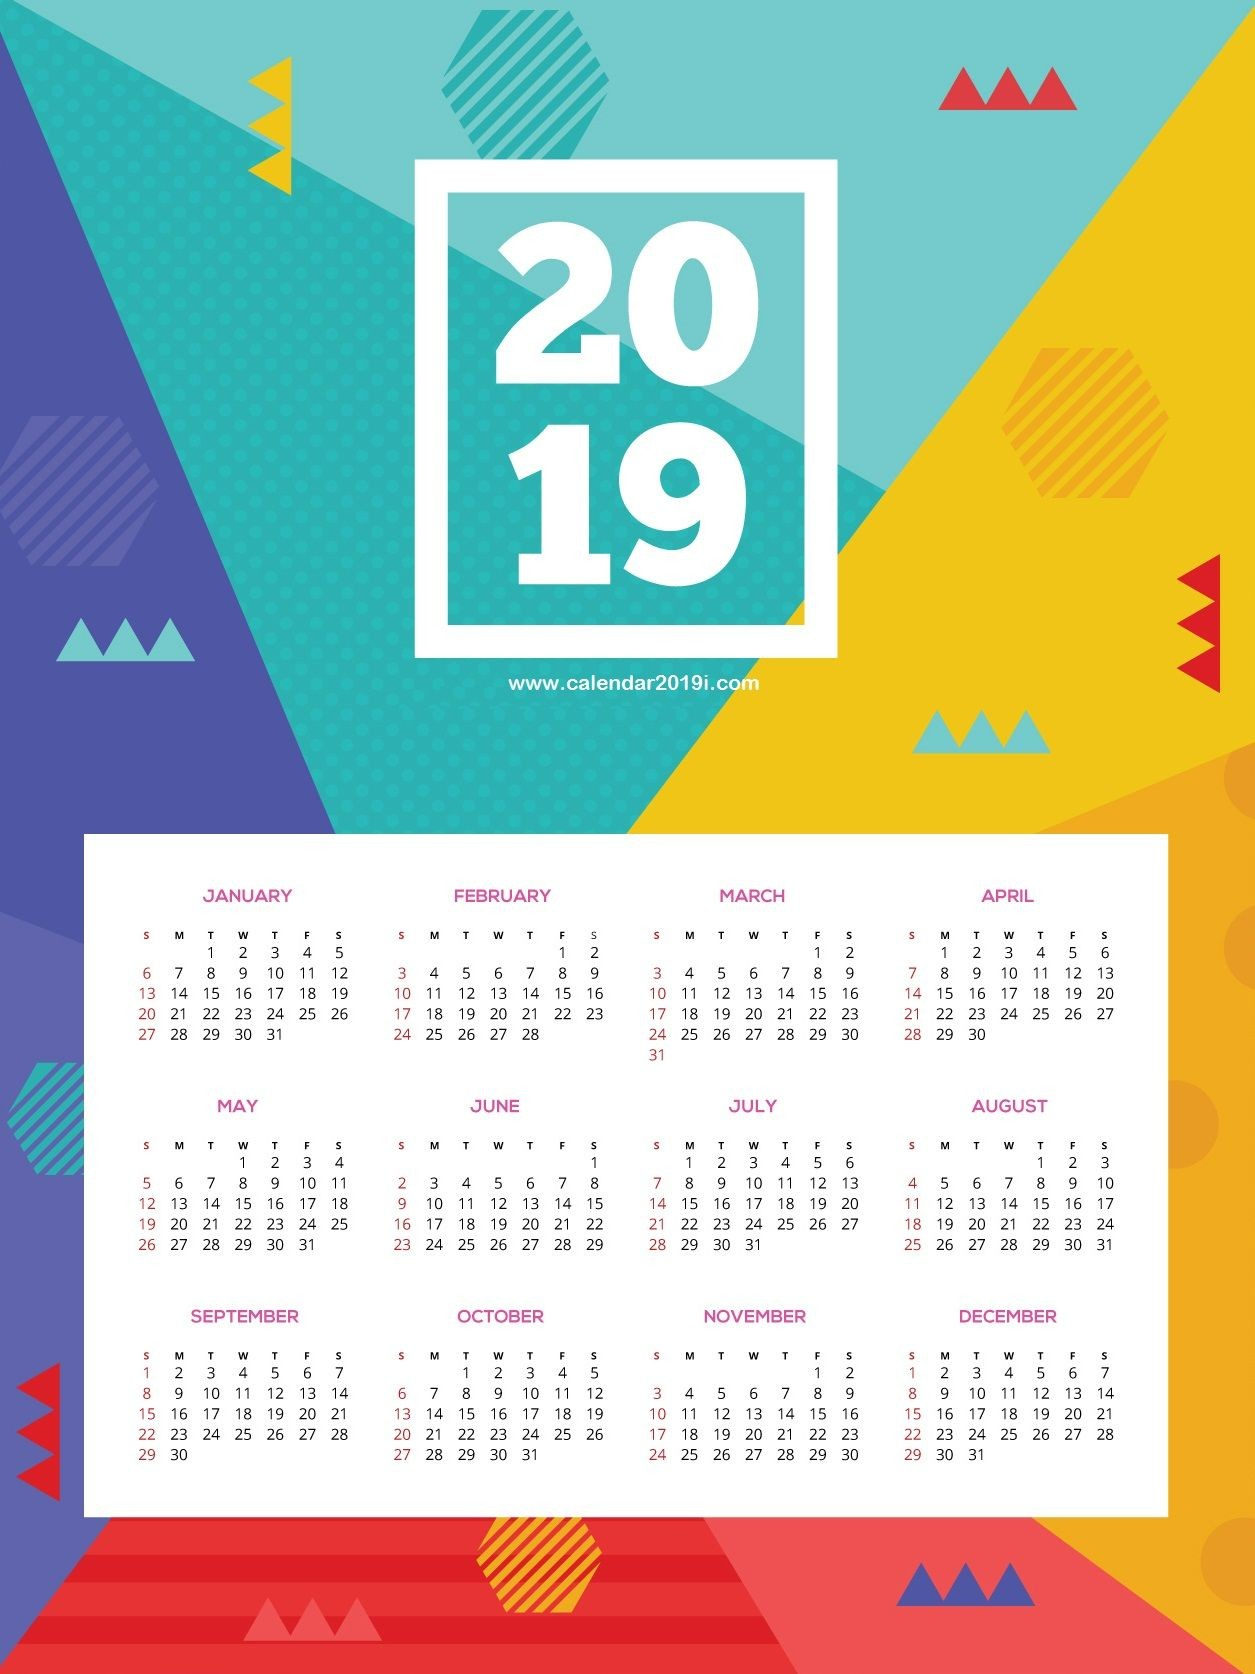 Calendario Para Imprimir 2019 Con Fotos Actual Printable 2019 Hd Wall Calendar Of Calendario Para Imprimir 2019 Con Fotos Más Reciente Observar Calendario Para Imprimir 2019 Pdf